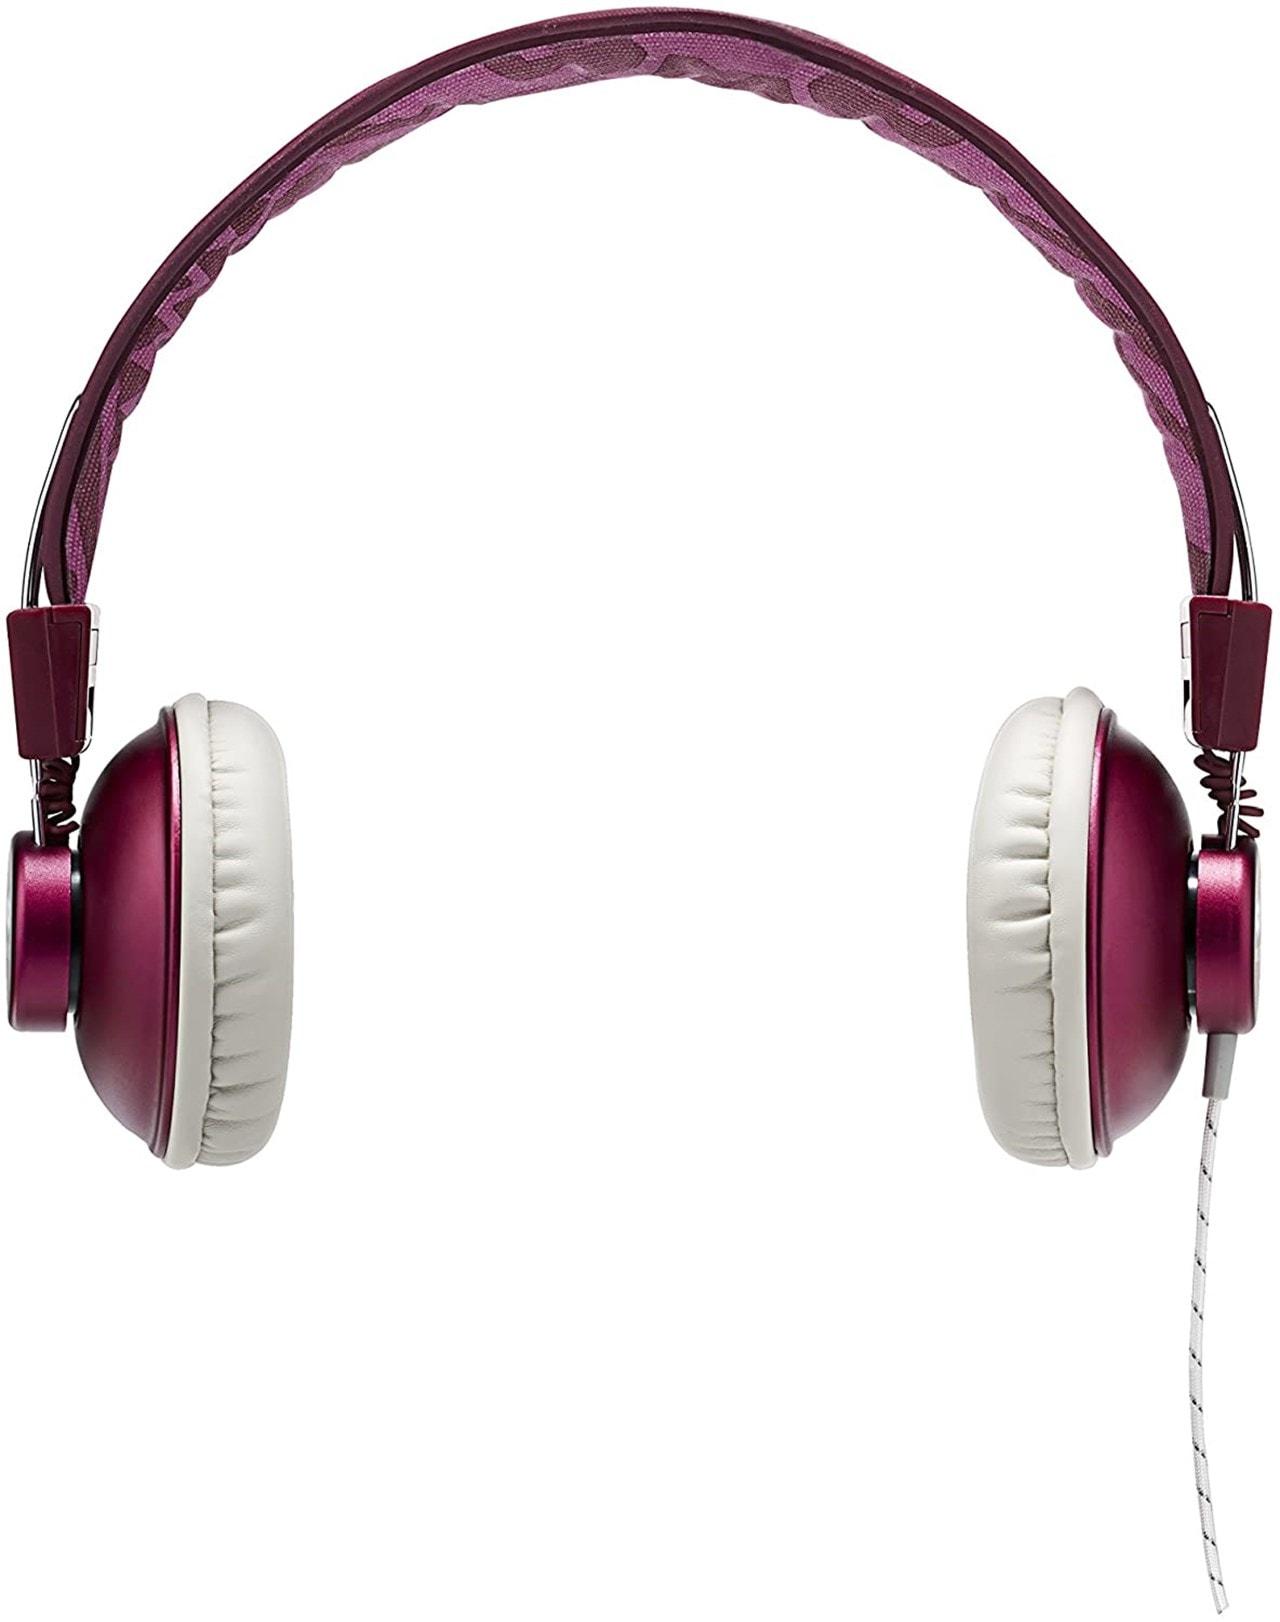 House Of Marley Positive Vibration Purple Headphones W/Mic (hmv Exclusive) - 3